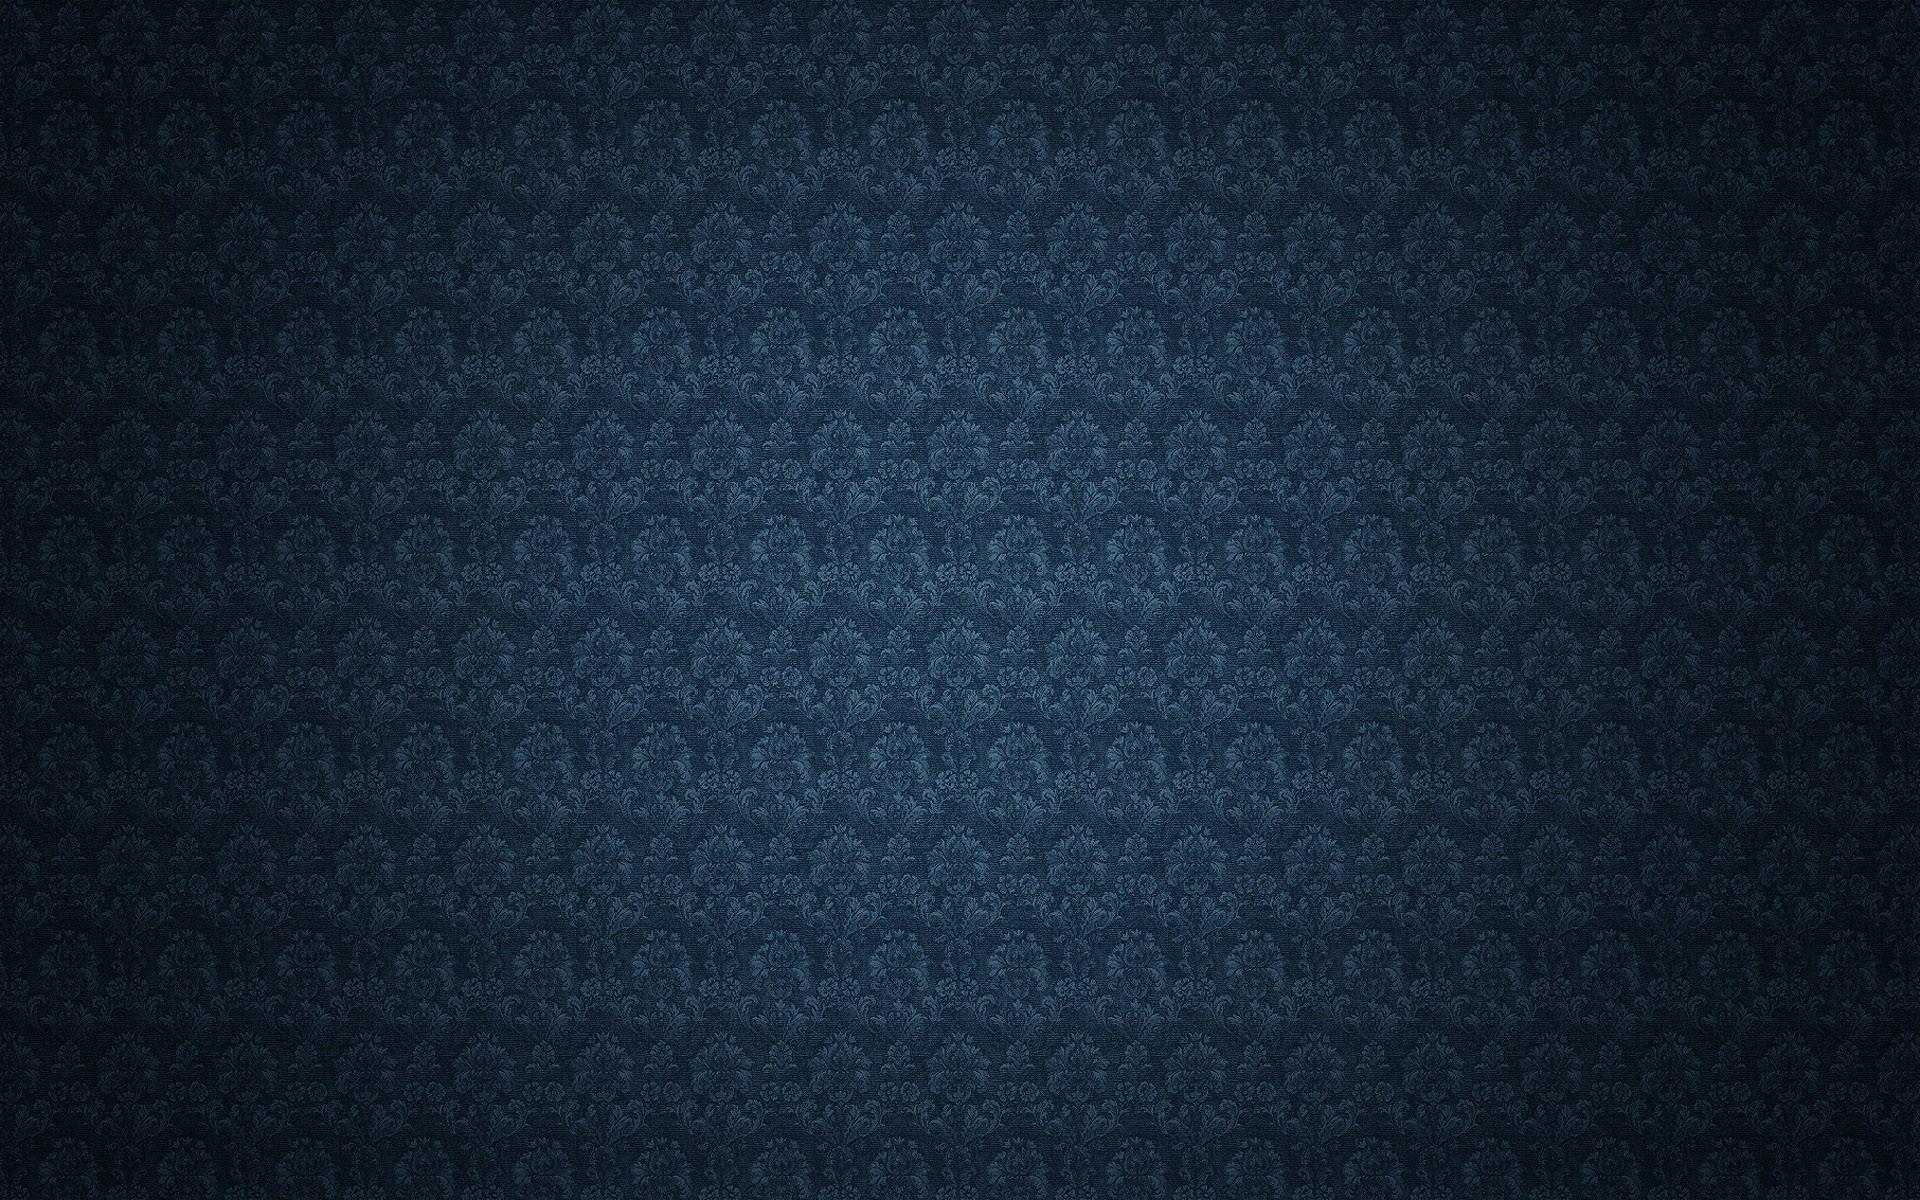 Dark Blue Background Images Wallpapertag: Abstract Blue Dark Textures Dark Blue Wallpaper